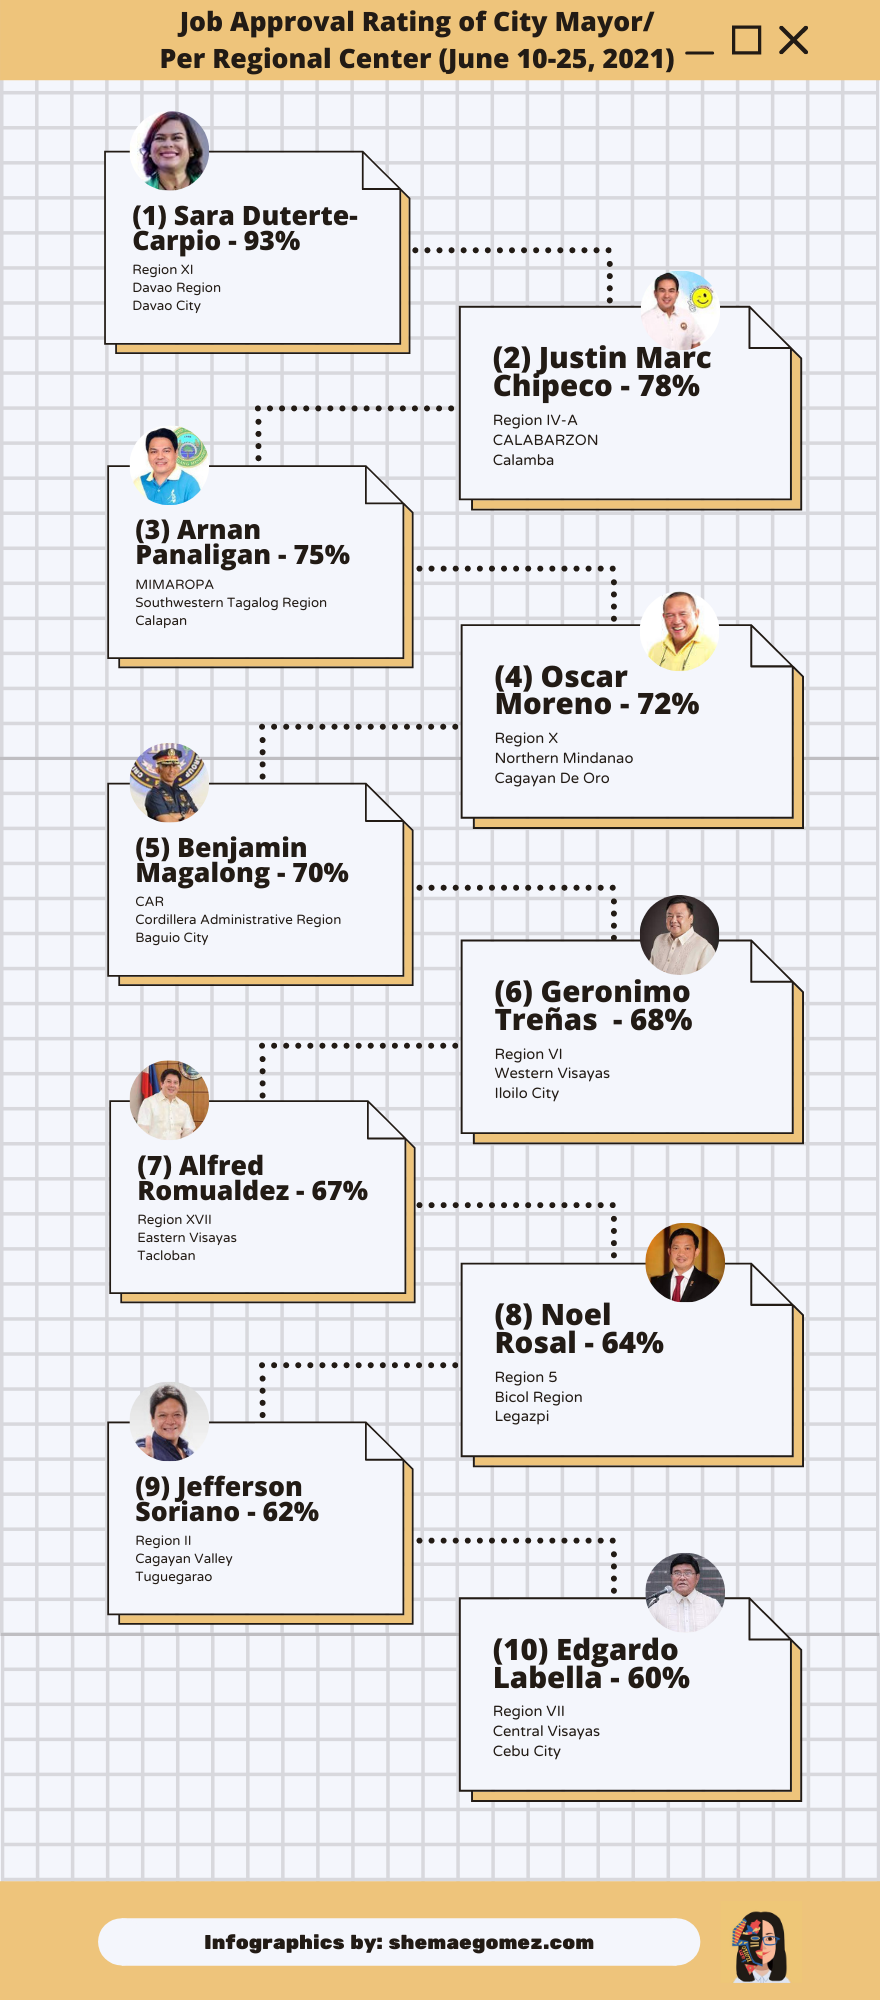 Rating of City Mayor